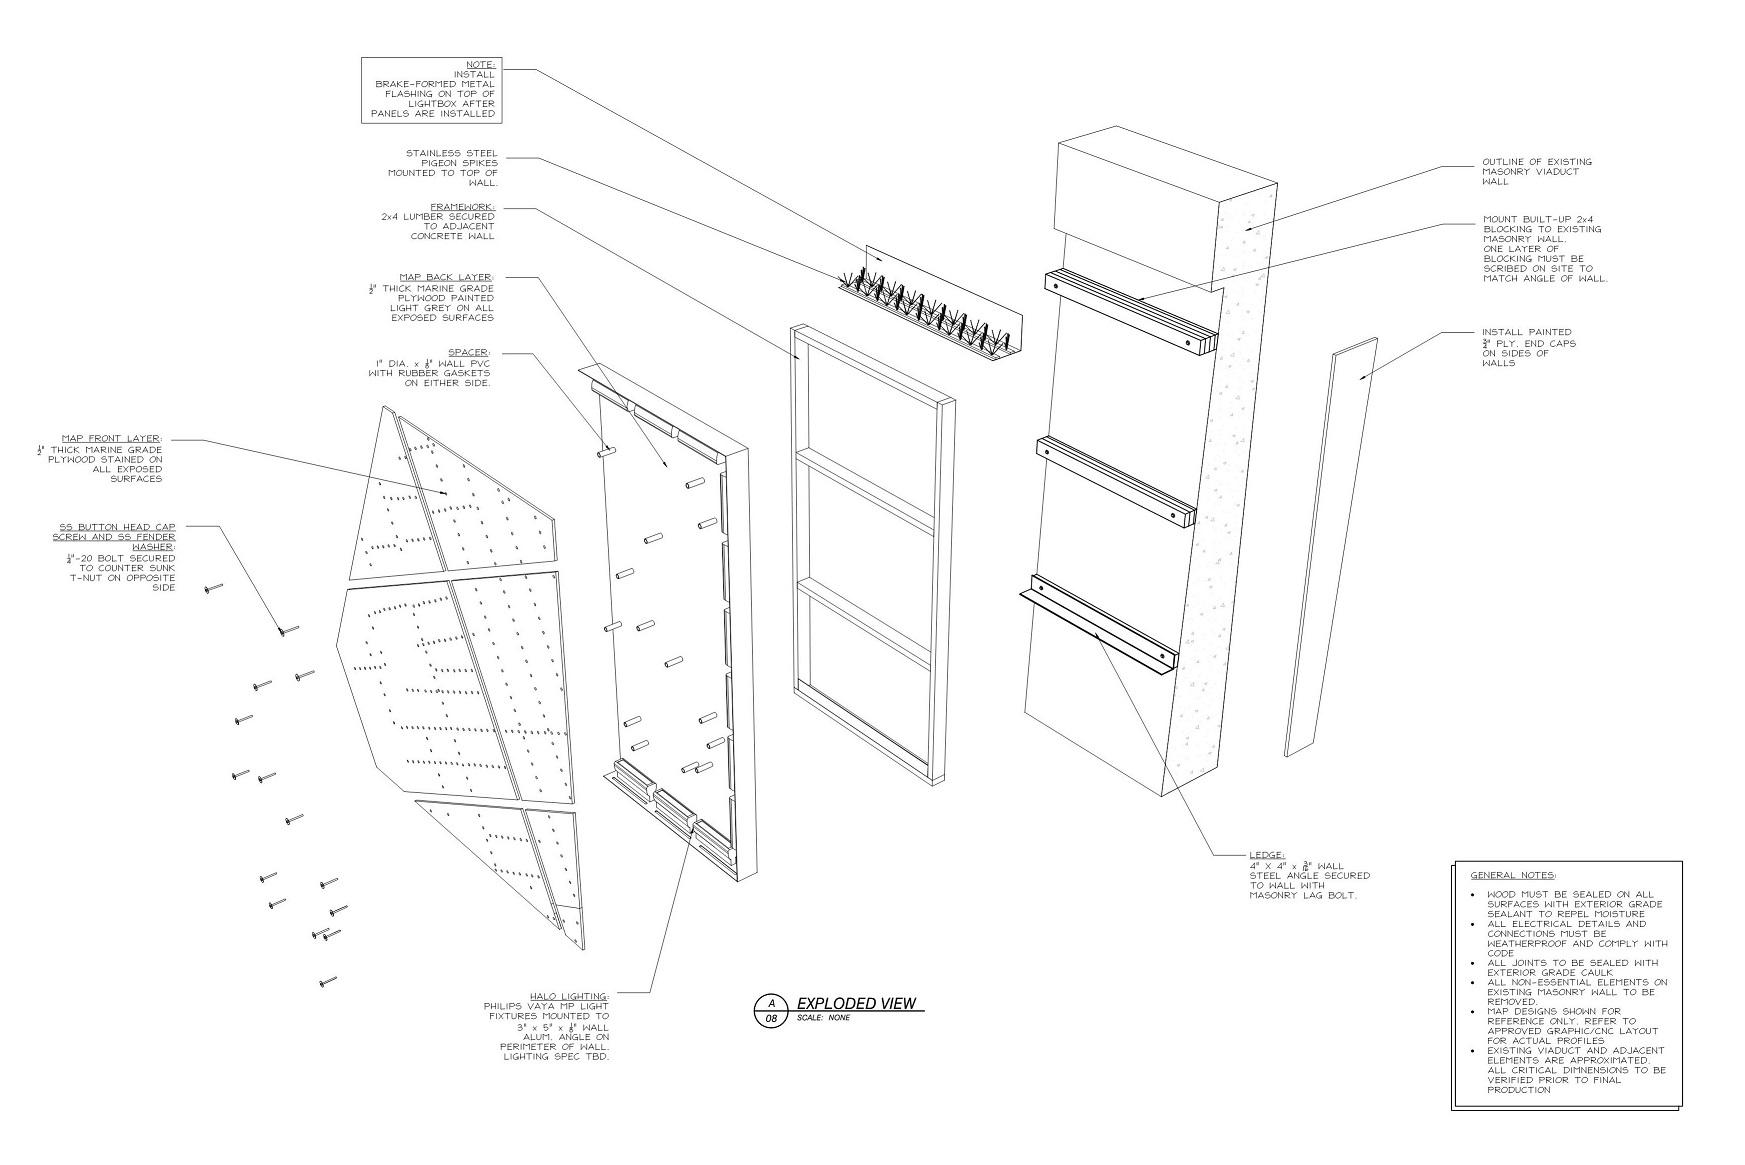 viaduct fab drawing01.jpg